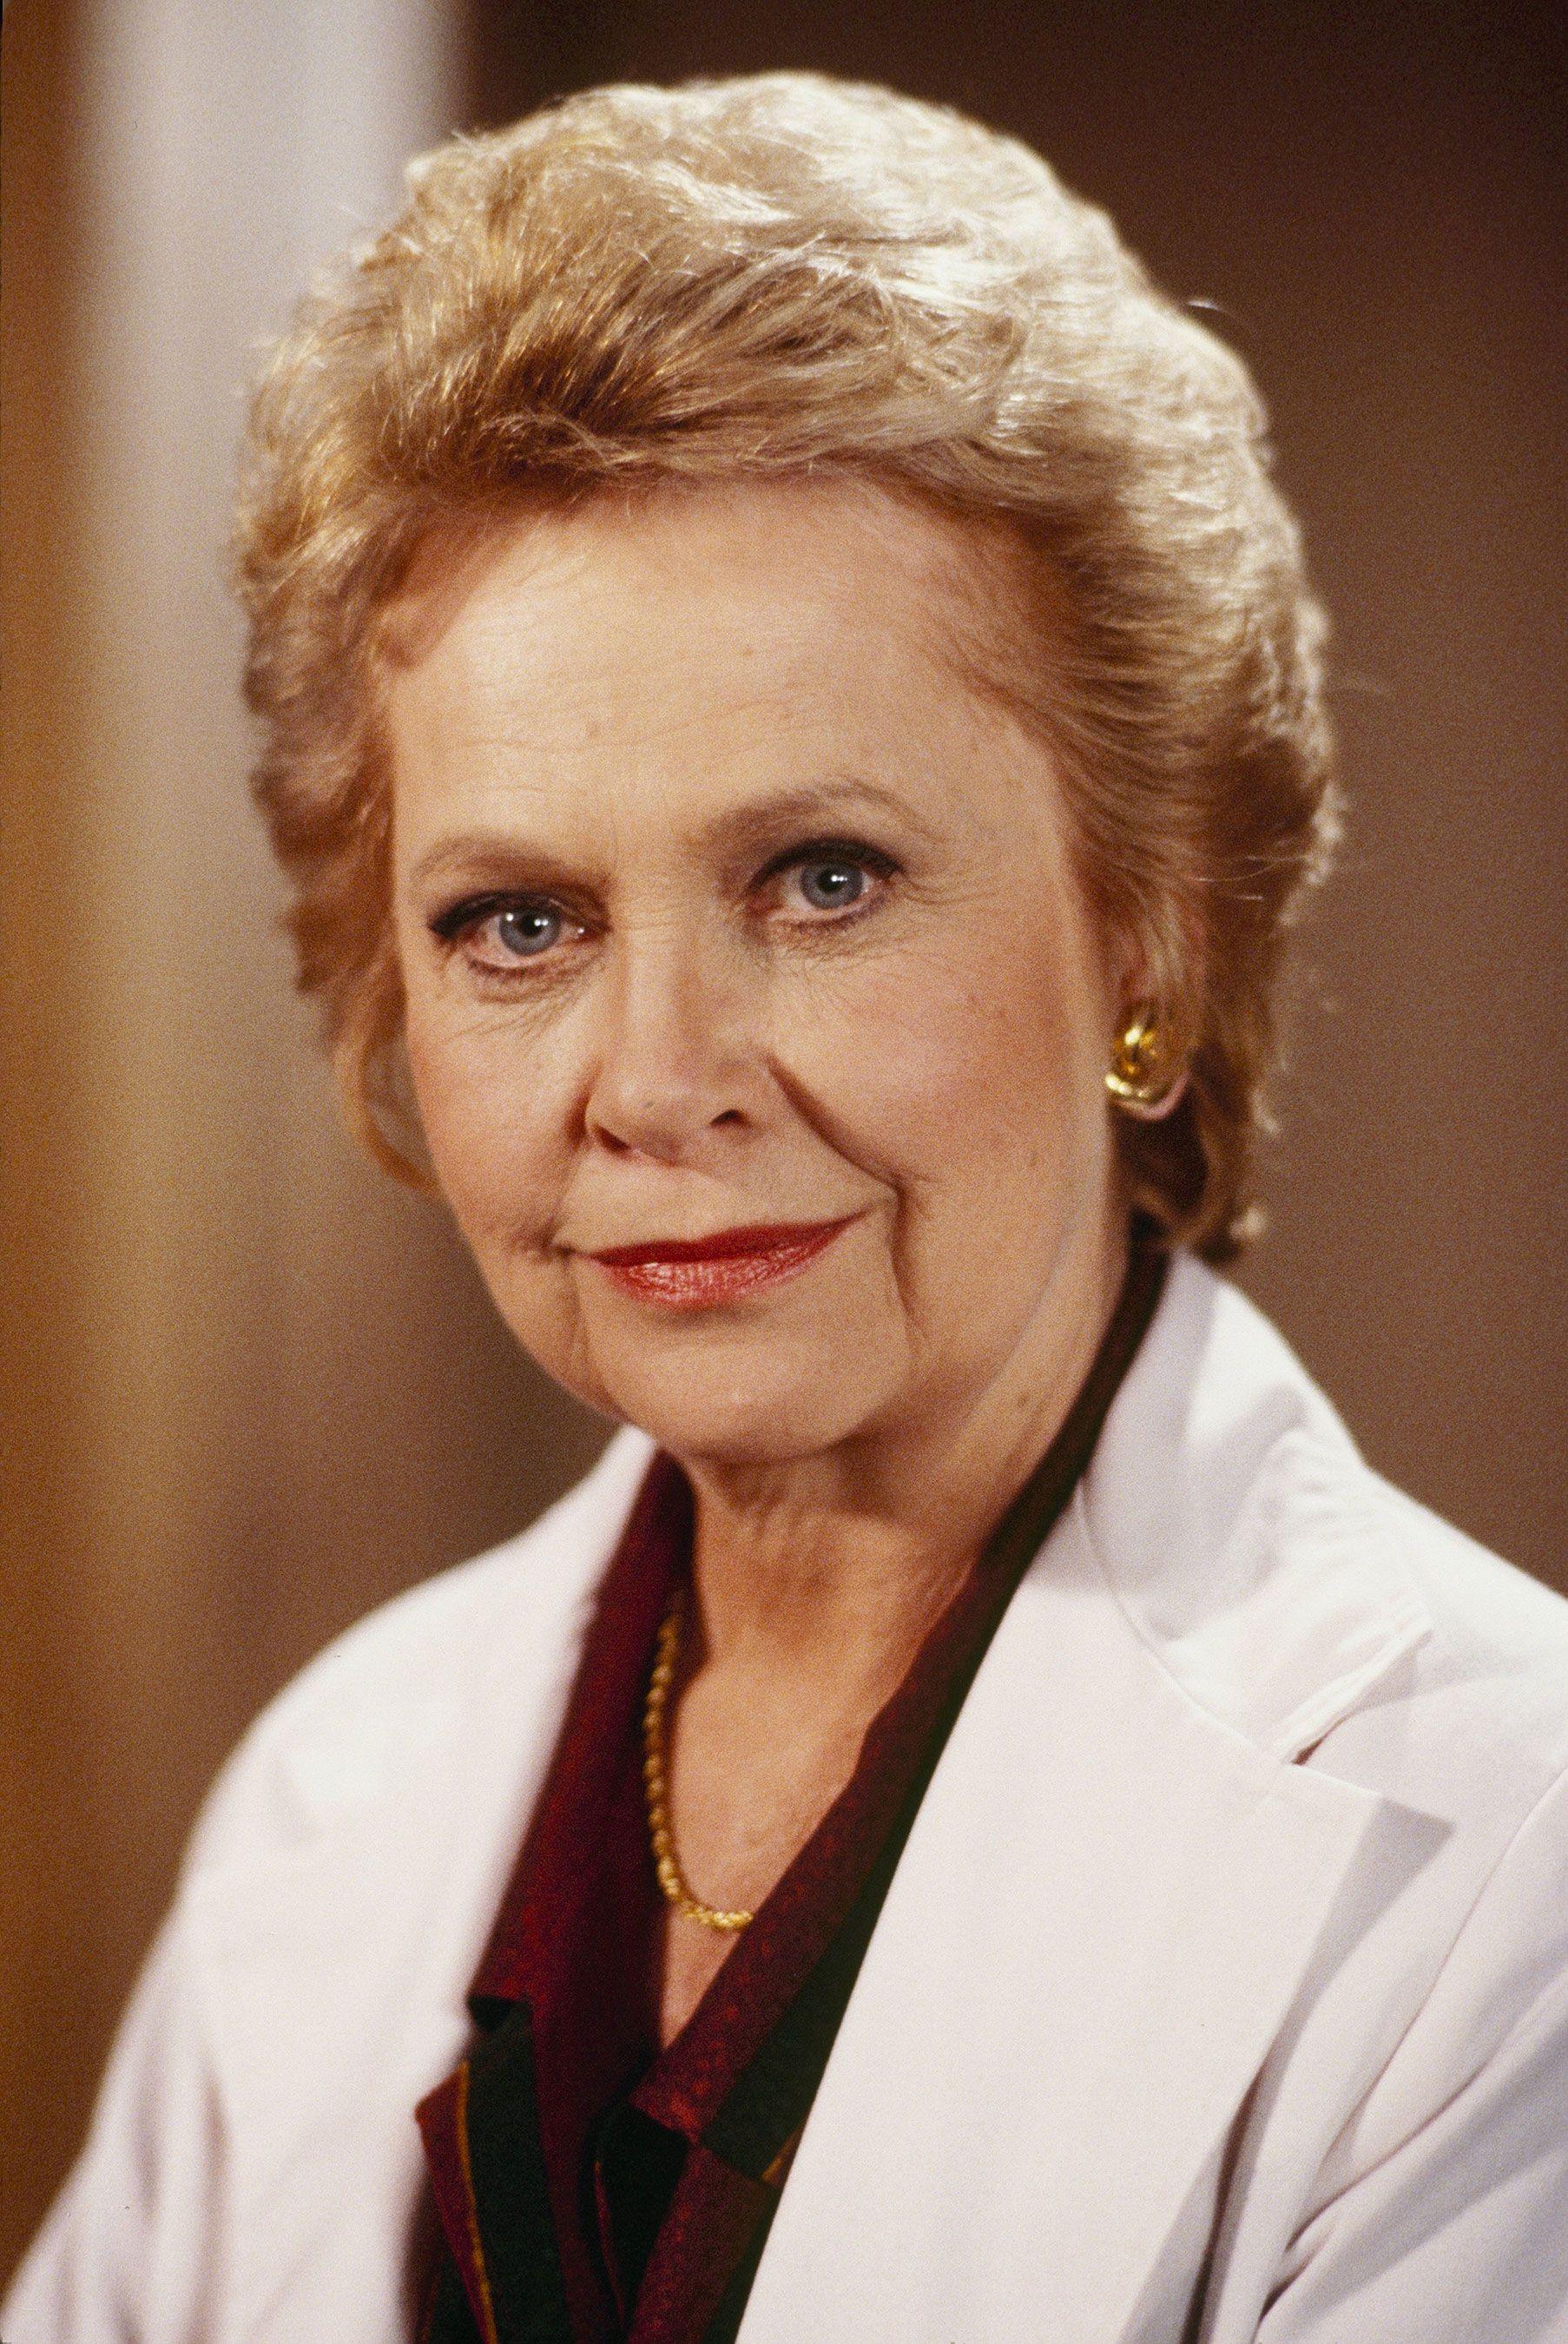 Georgann Johnson Veteran Tv And Broadway Star Dies At 91 Dr Quinn Medicine Woman Dr Quinn Character Actor